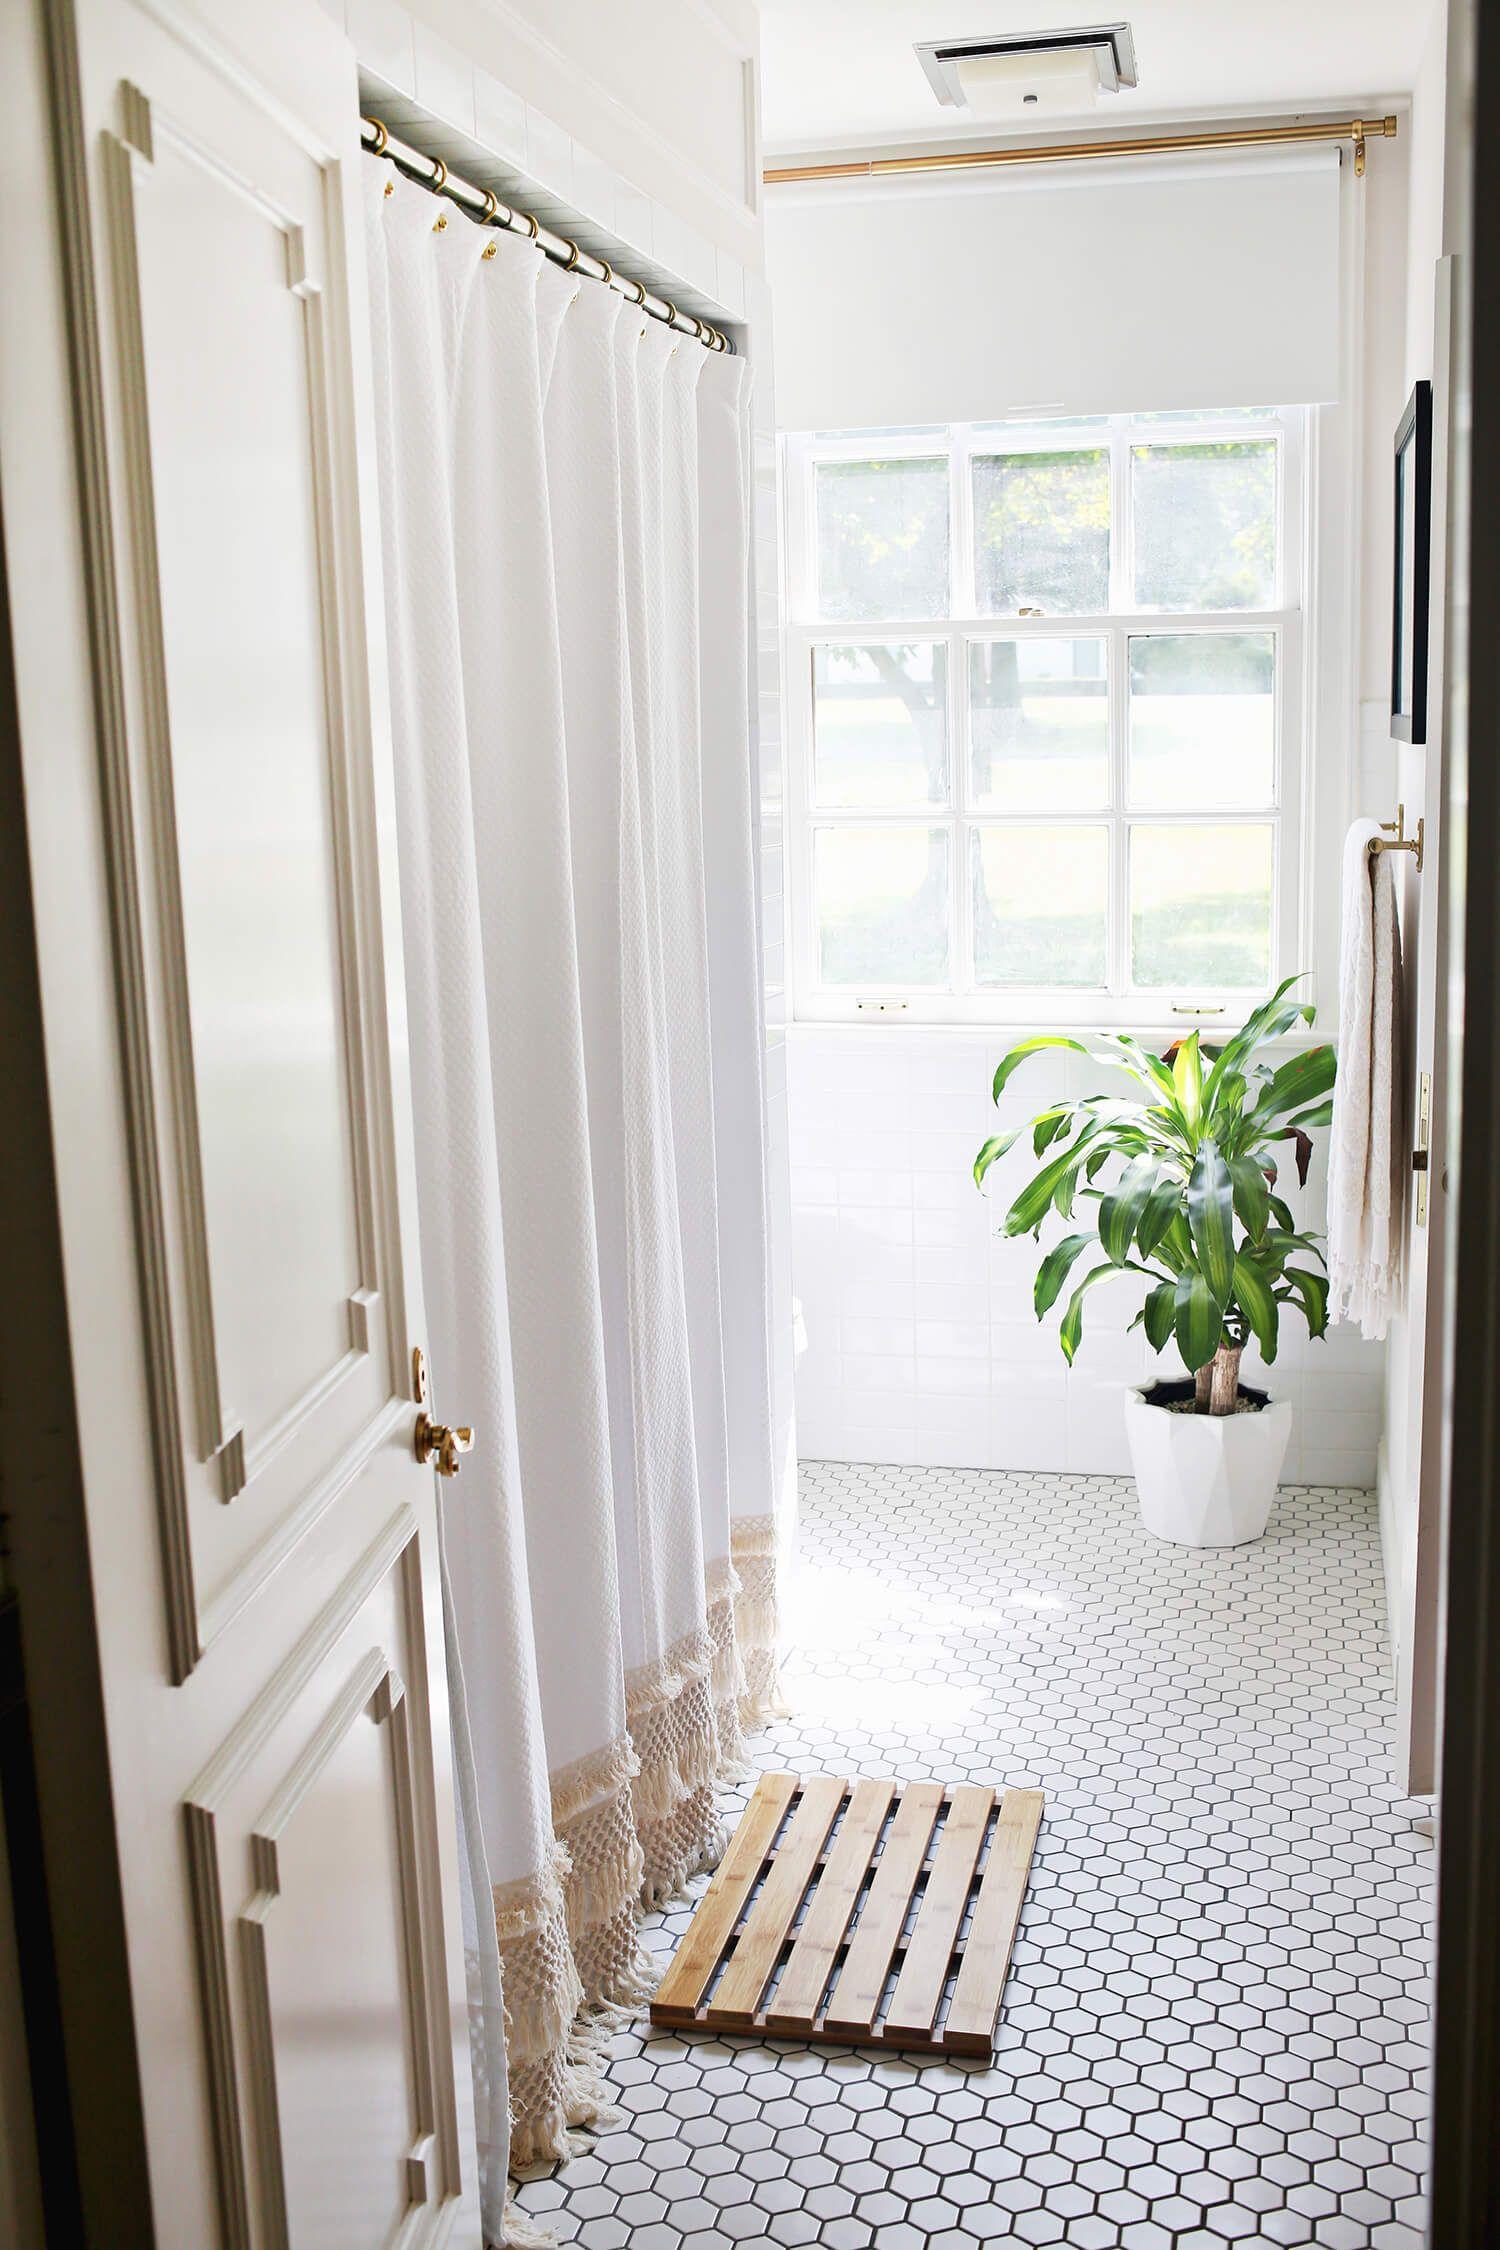 Macrame Shower Curtain Diy Diy Curtains Elegant Curtains Diy Shower Curtain